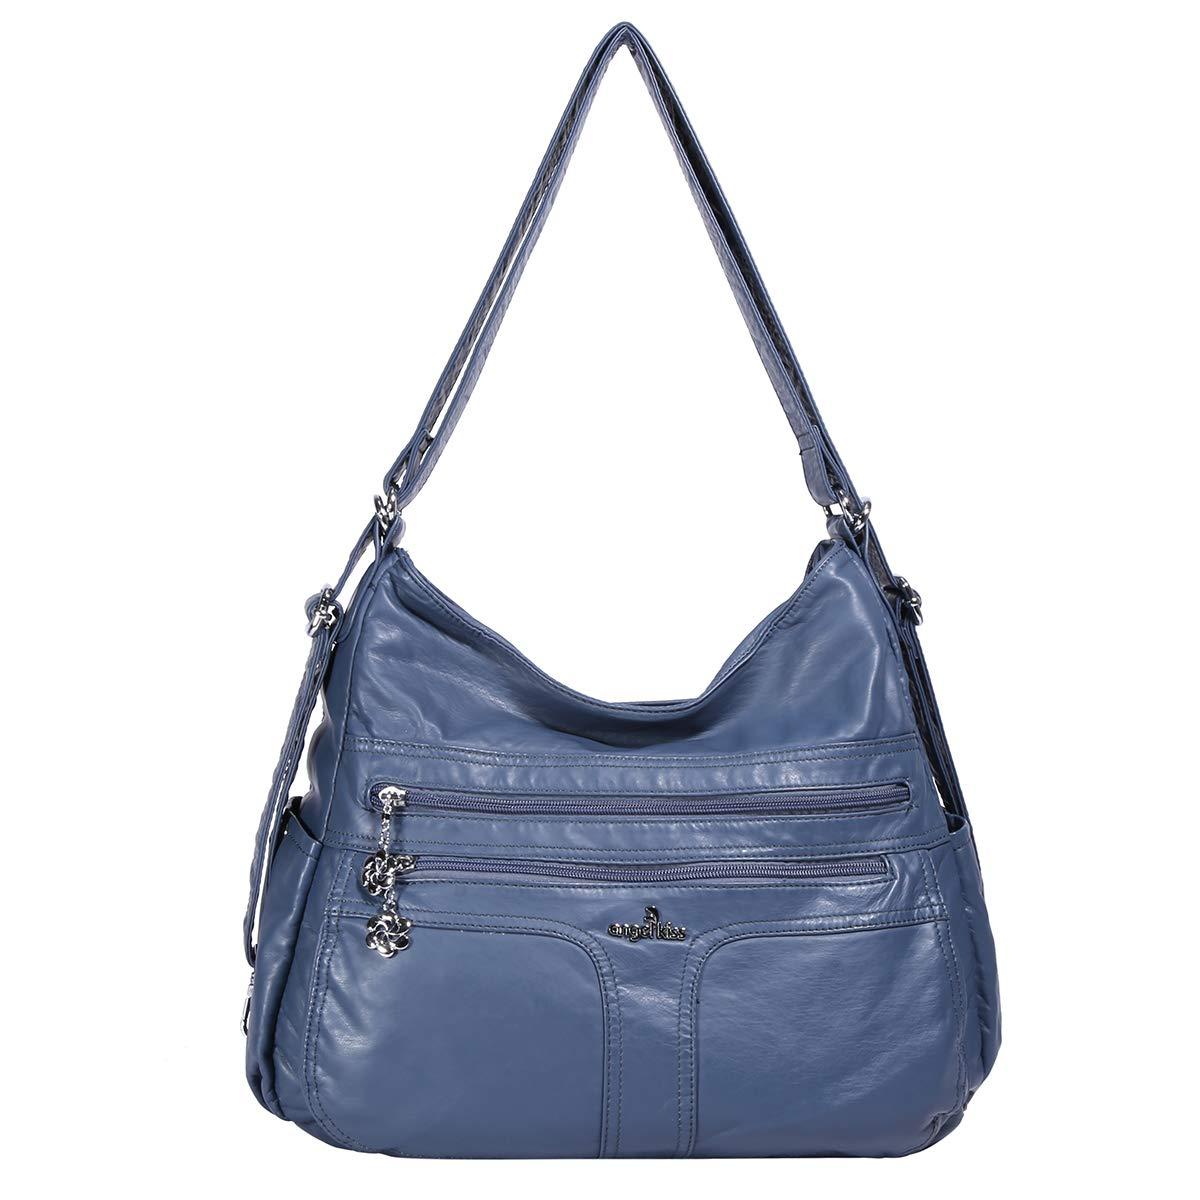 Angelkiss Women's Multifunctional Shoulder Hobo Bag Soft Leather Messenger Crossbody Purse Satchels Handbags with Zipper Blue